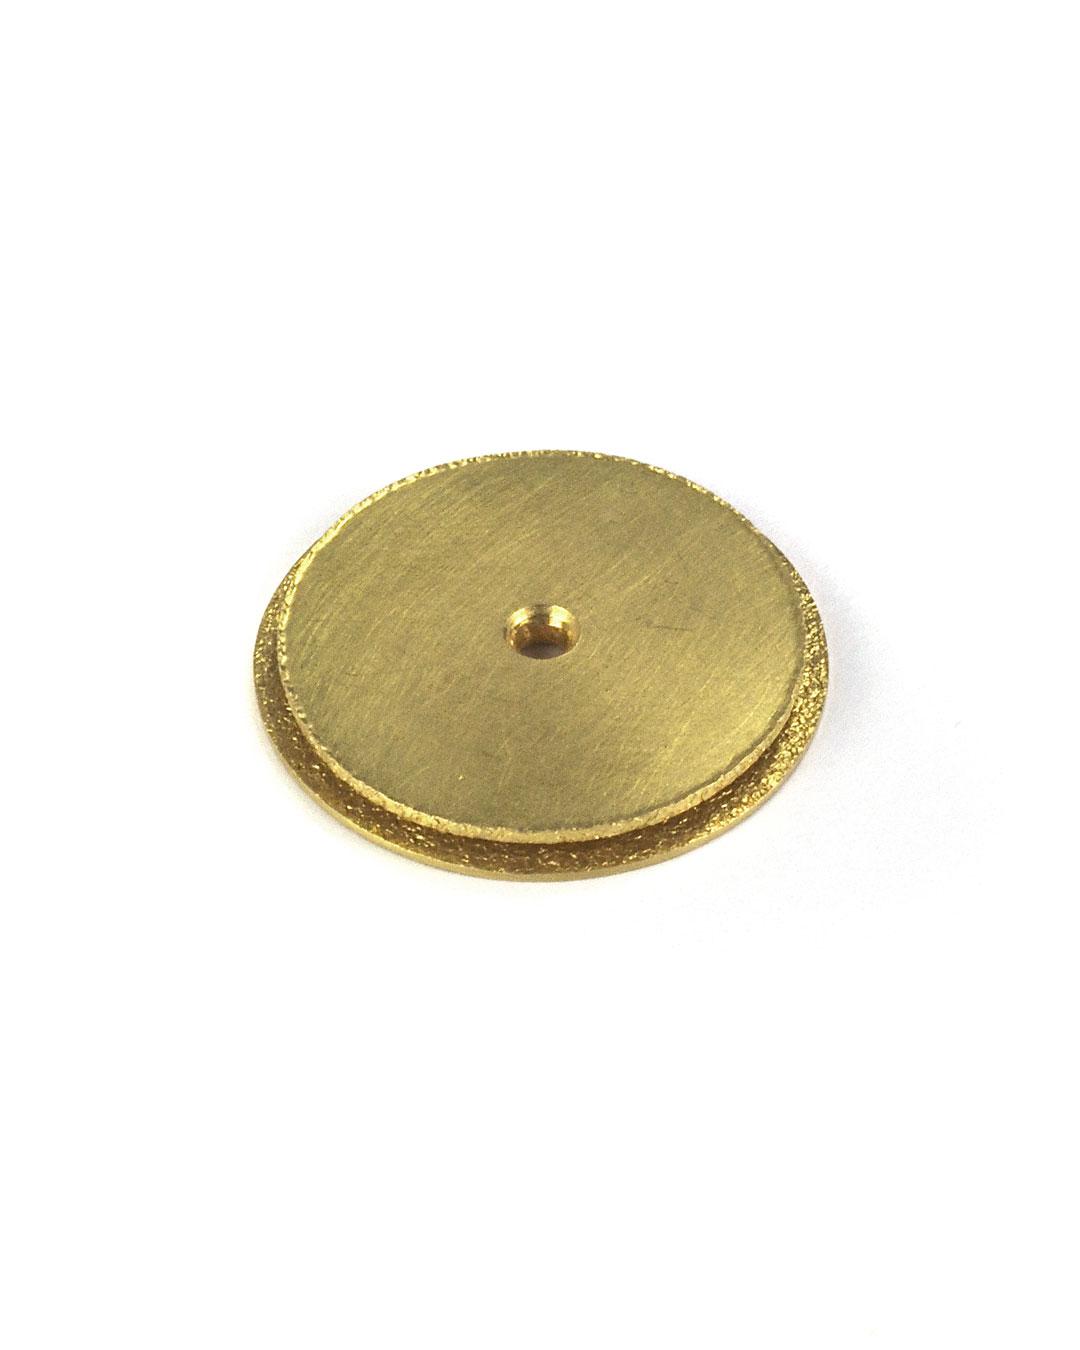 Okinari Kurokawa, untitled, 2002, pendant; 20ct gold, ø 21 x 3 mm